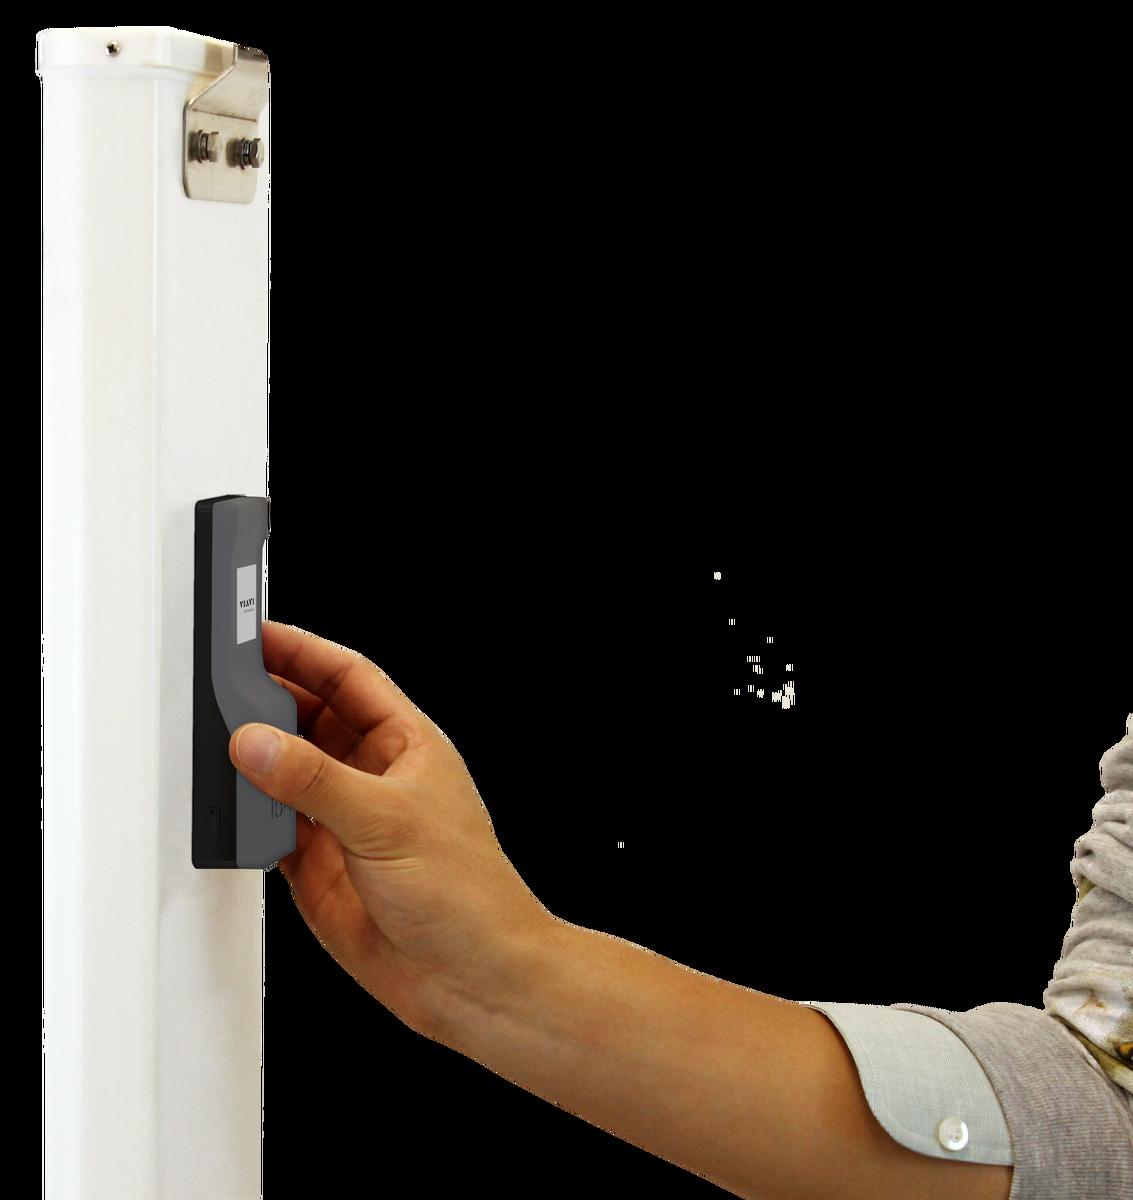 VIAVI IoA Antenna Alignment Sensor mounted